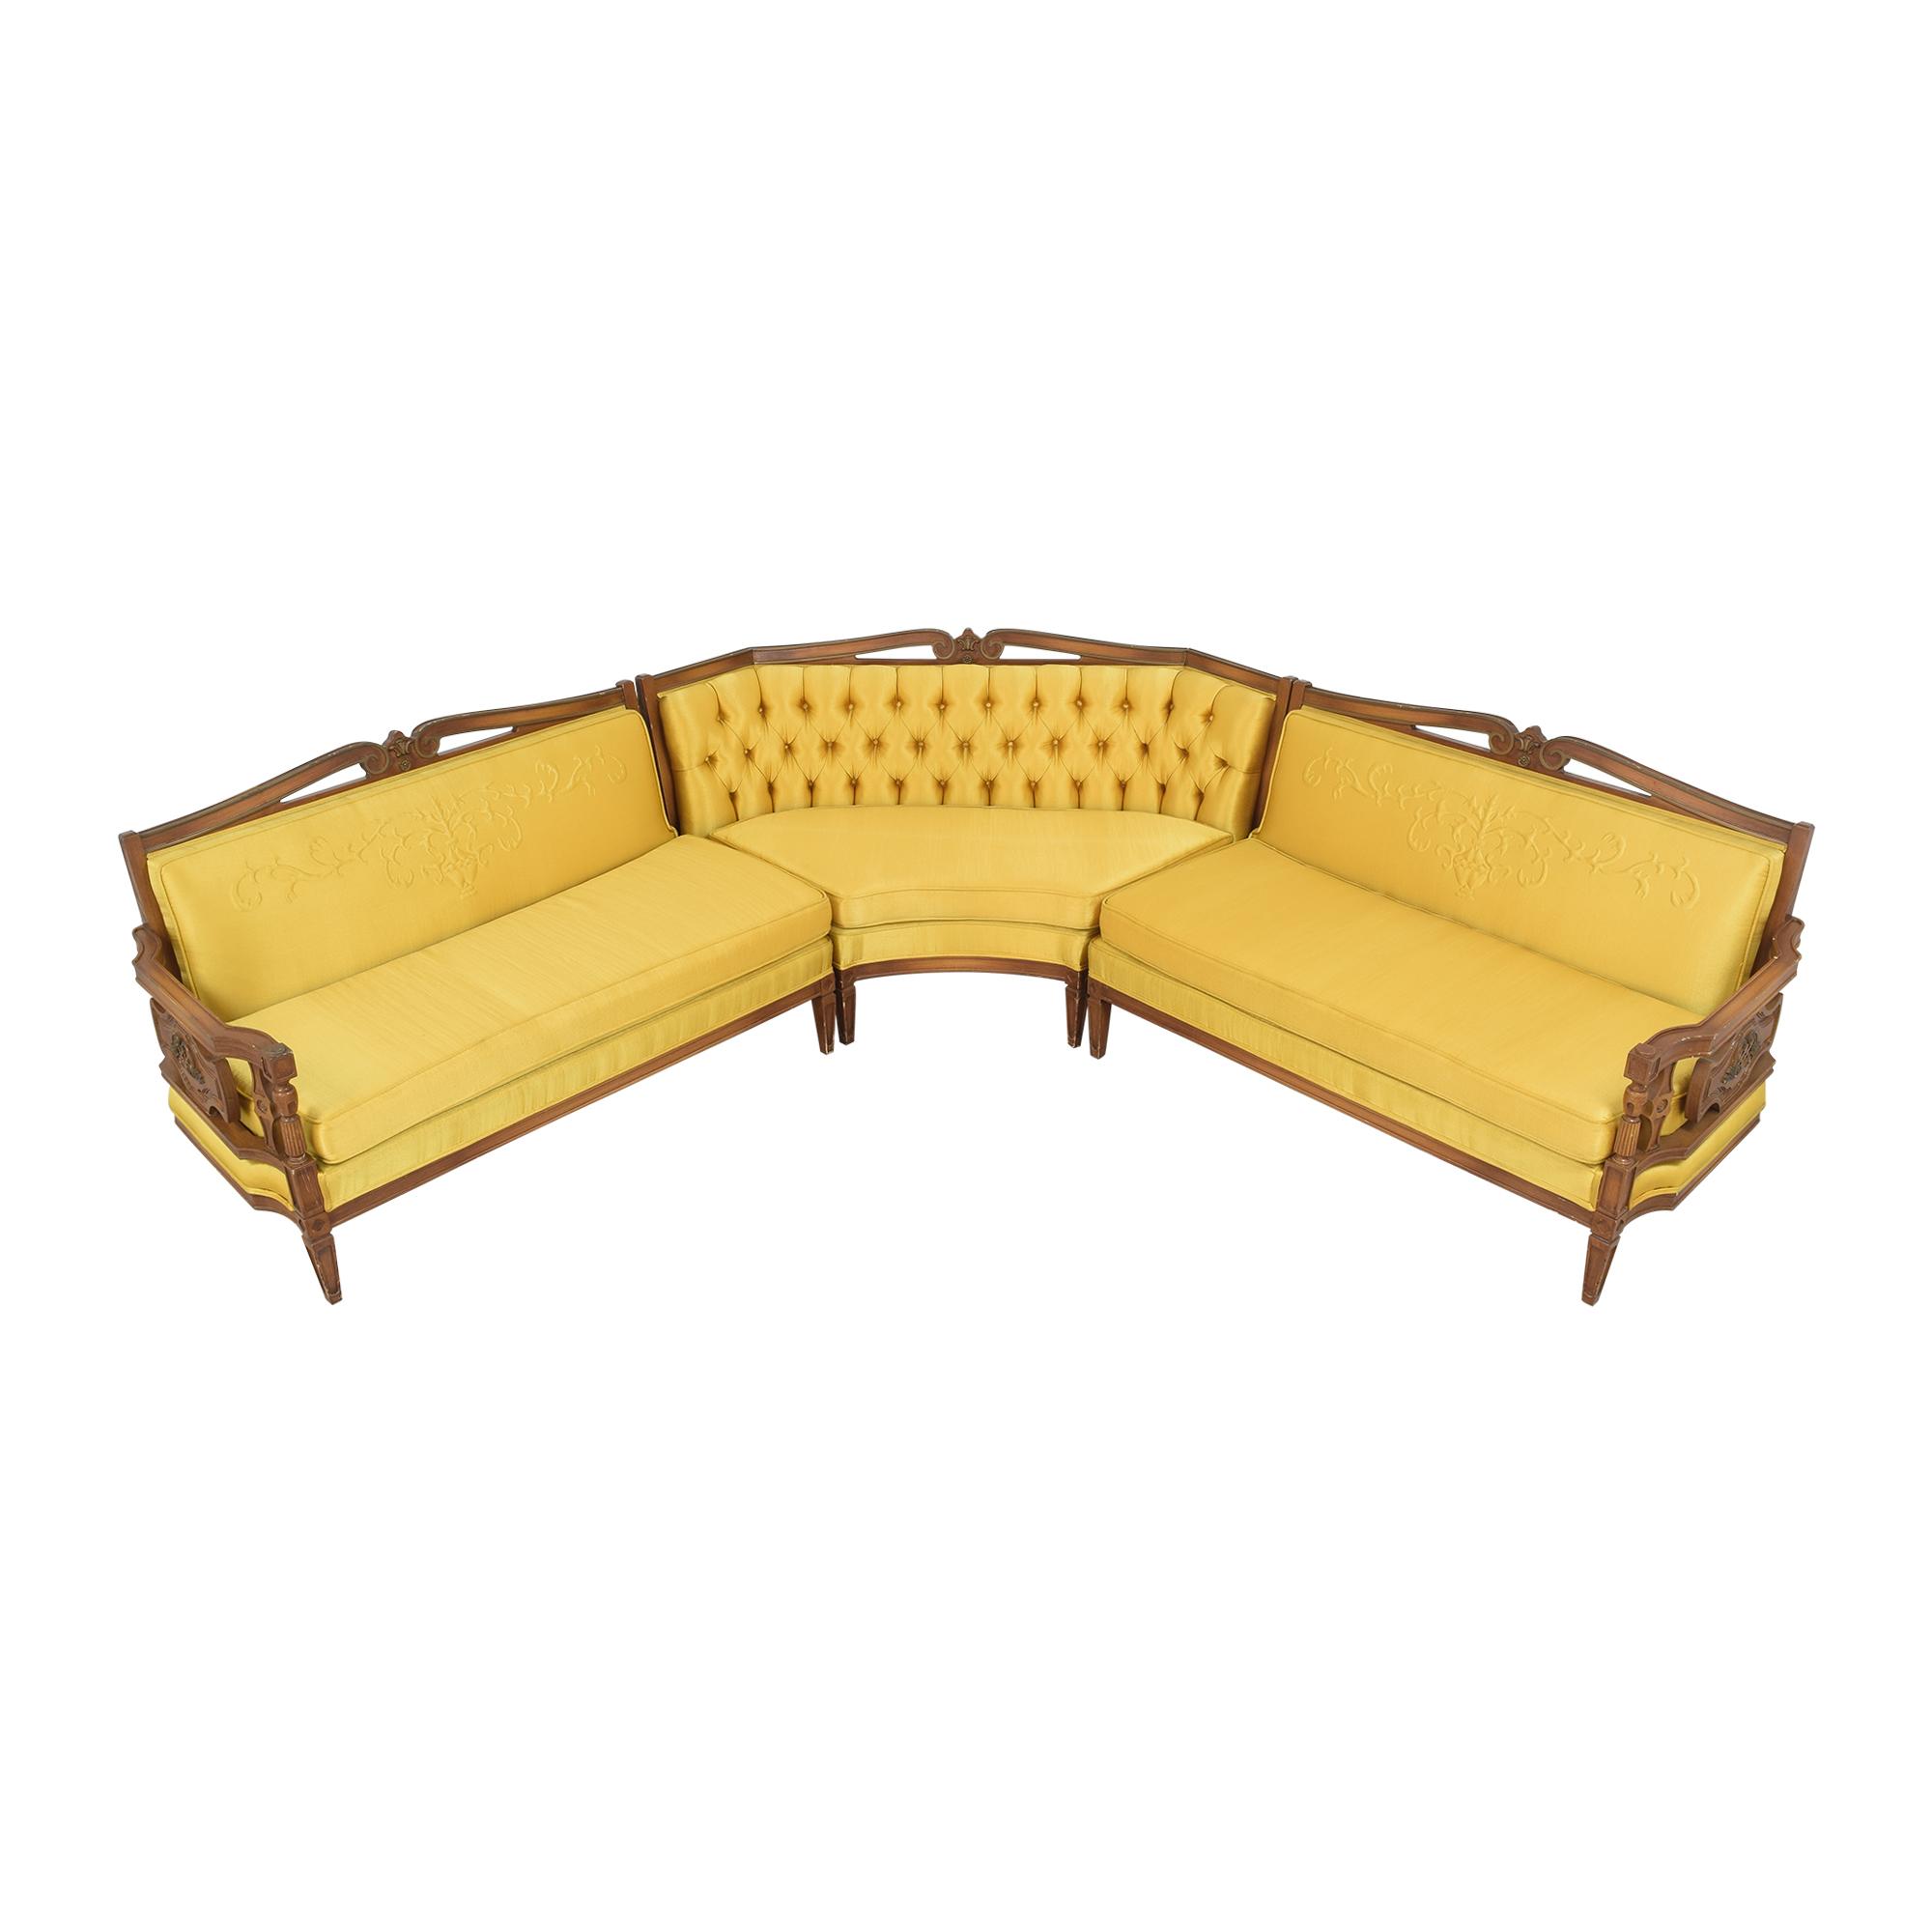 Vintage-Style Corner Sectional Sofa / Sofas